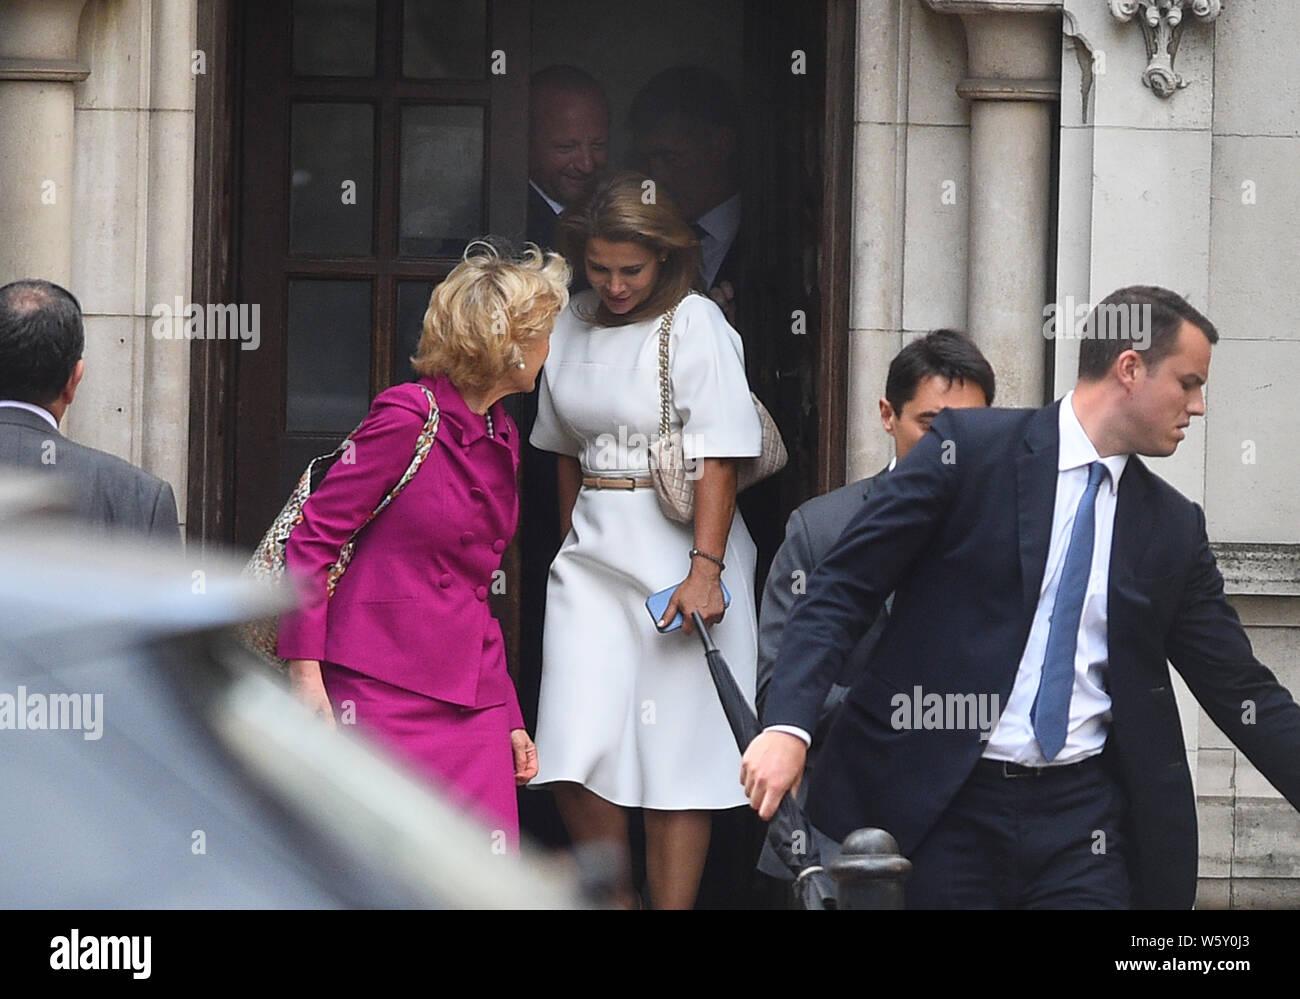 Princess Haya Bint Al Hussein and her lawyer Baroness Fiona